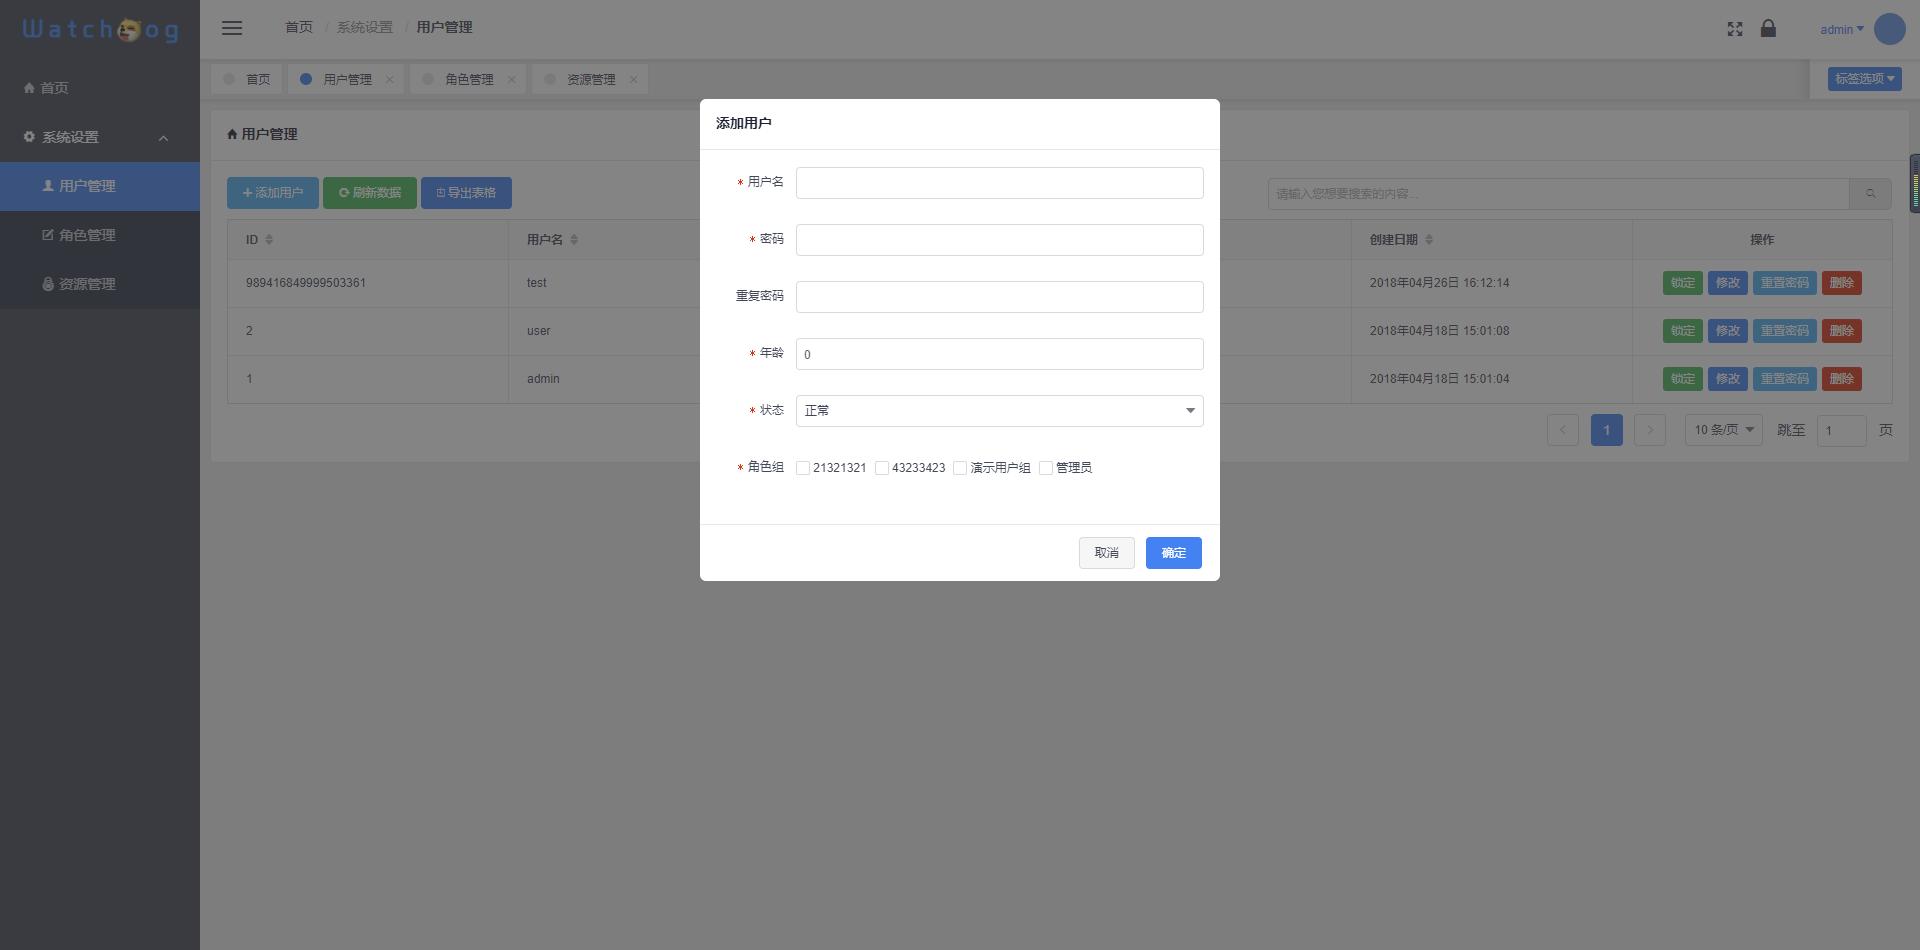 WatchDog一款基于SpringBoot+Vue的轻量级管理系统快速开发脚手架